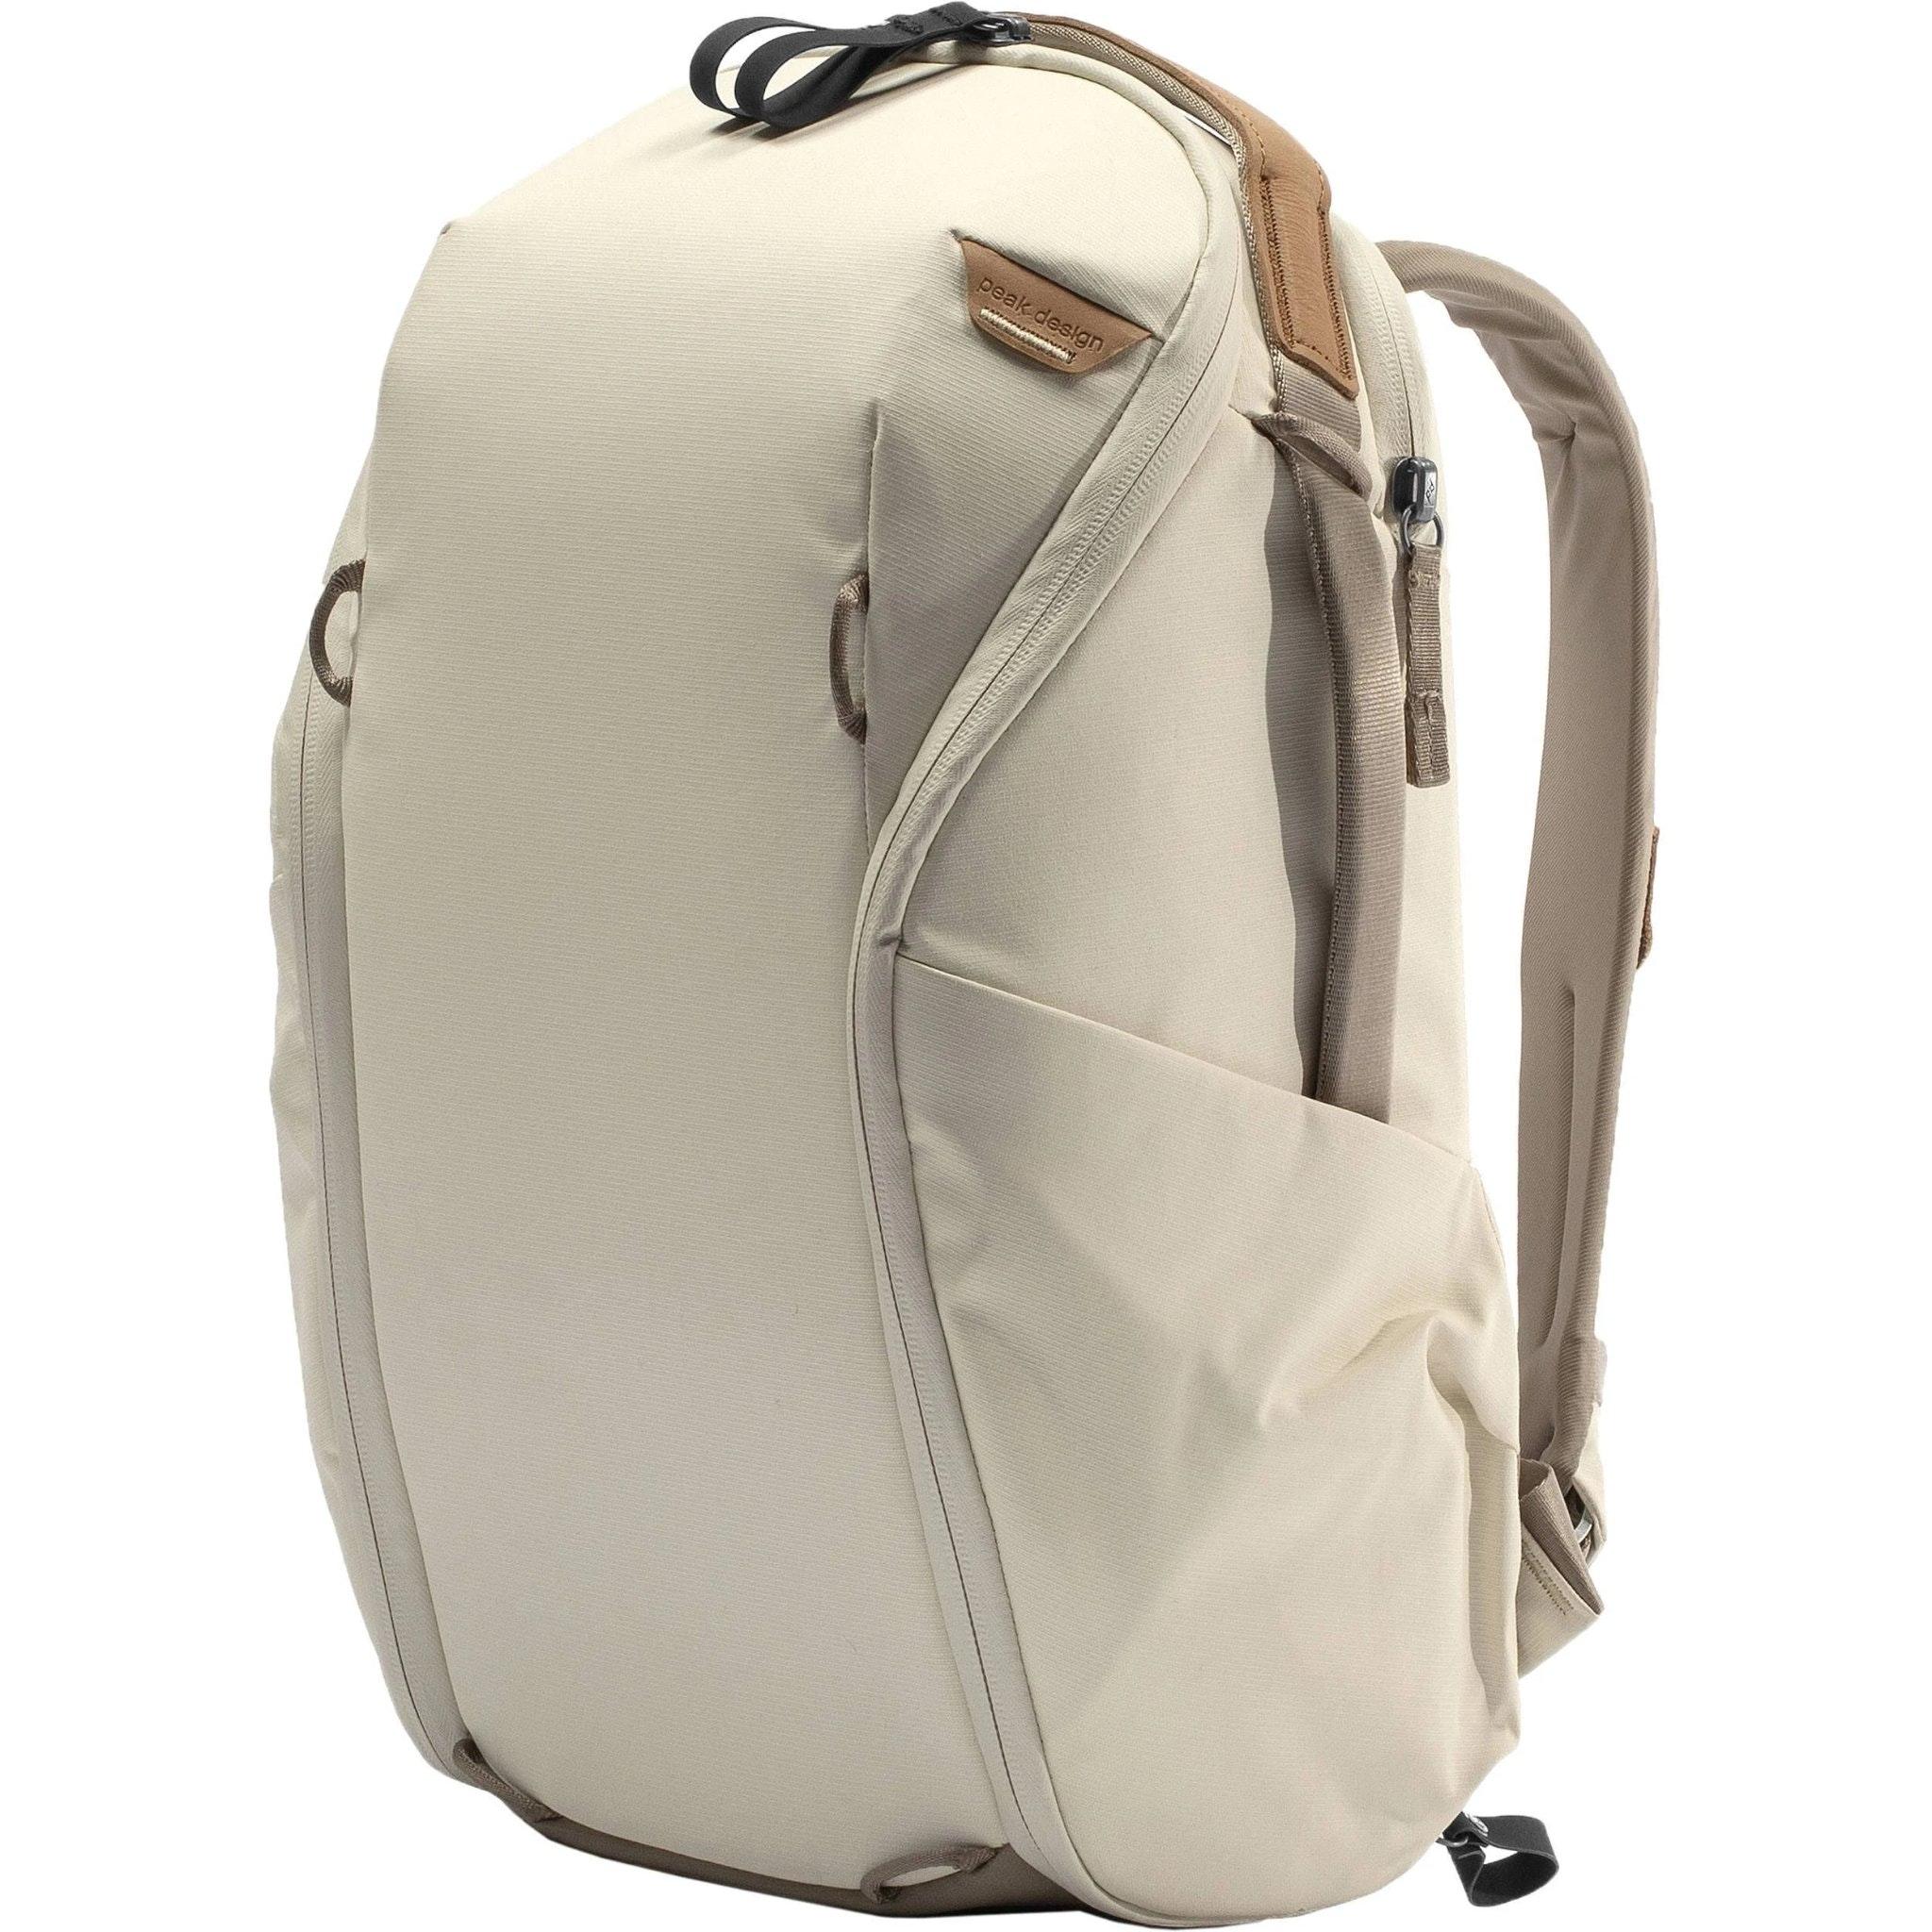 Peak Design Everyday Zip Backpack 20l